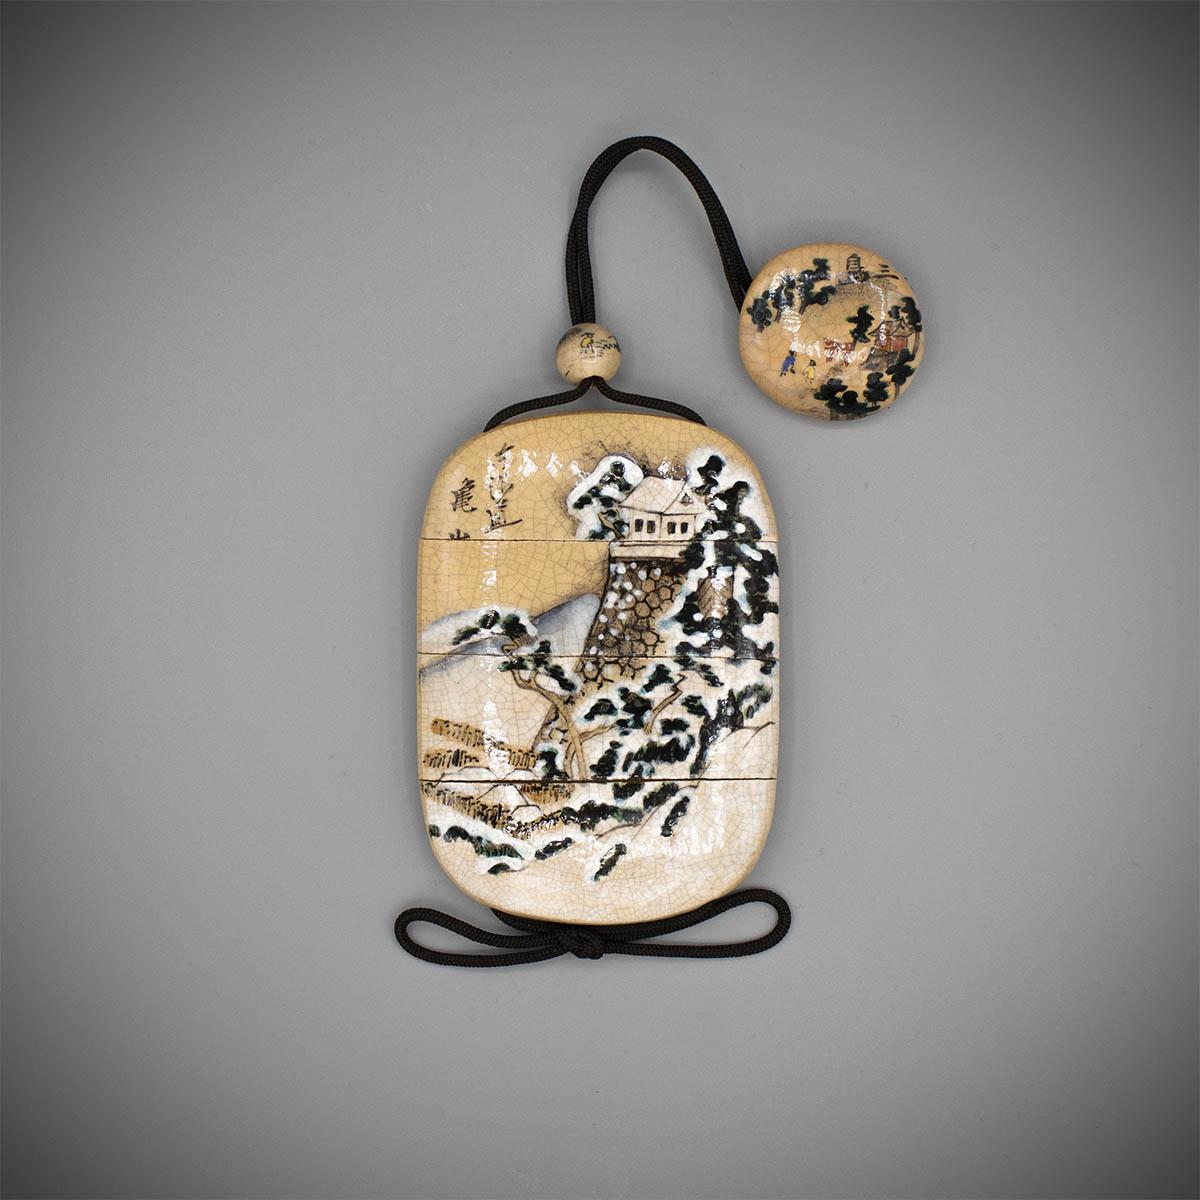 Three case earthenware inro by Miura Kenya (Ogata Kenzan VI), MR3671_v.1